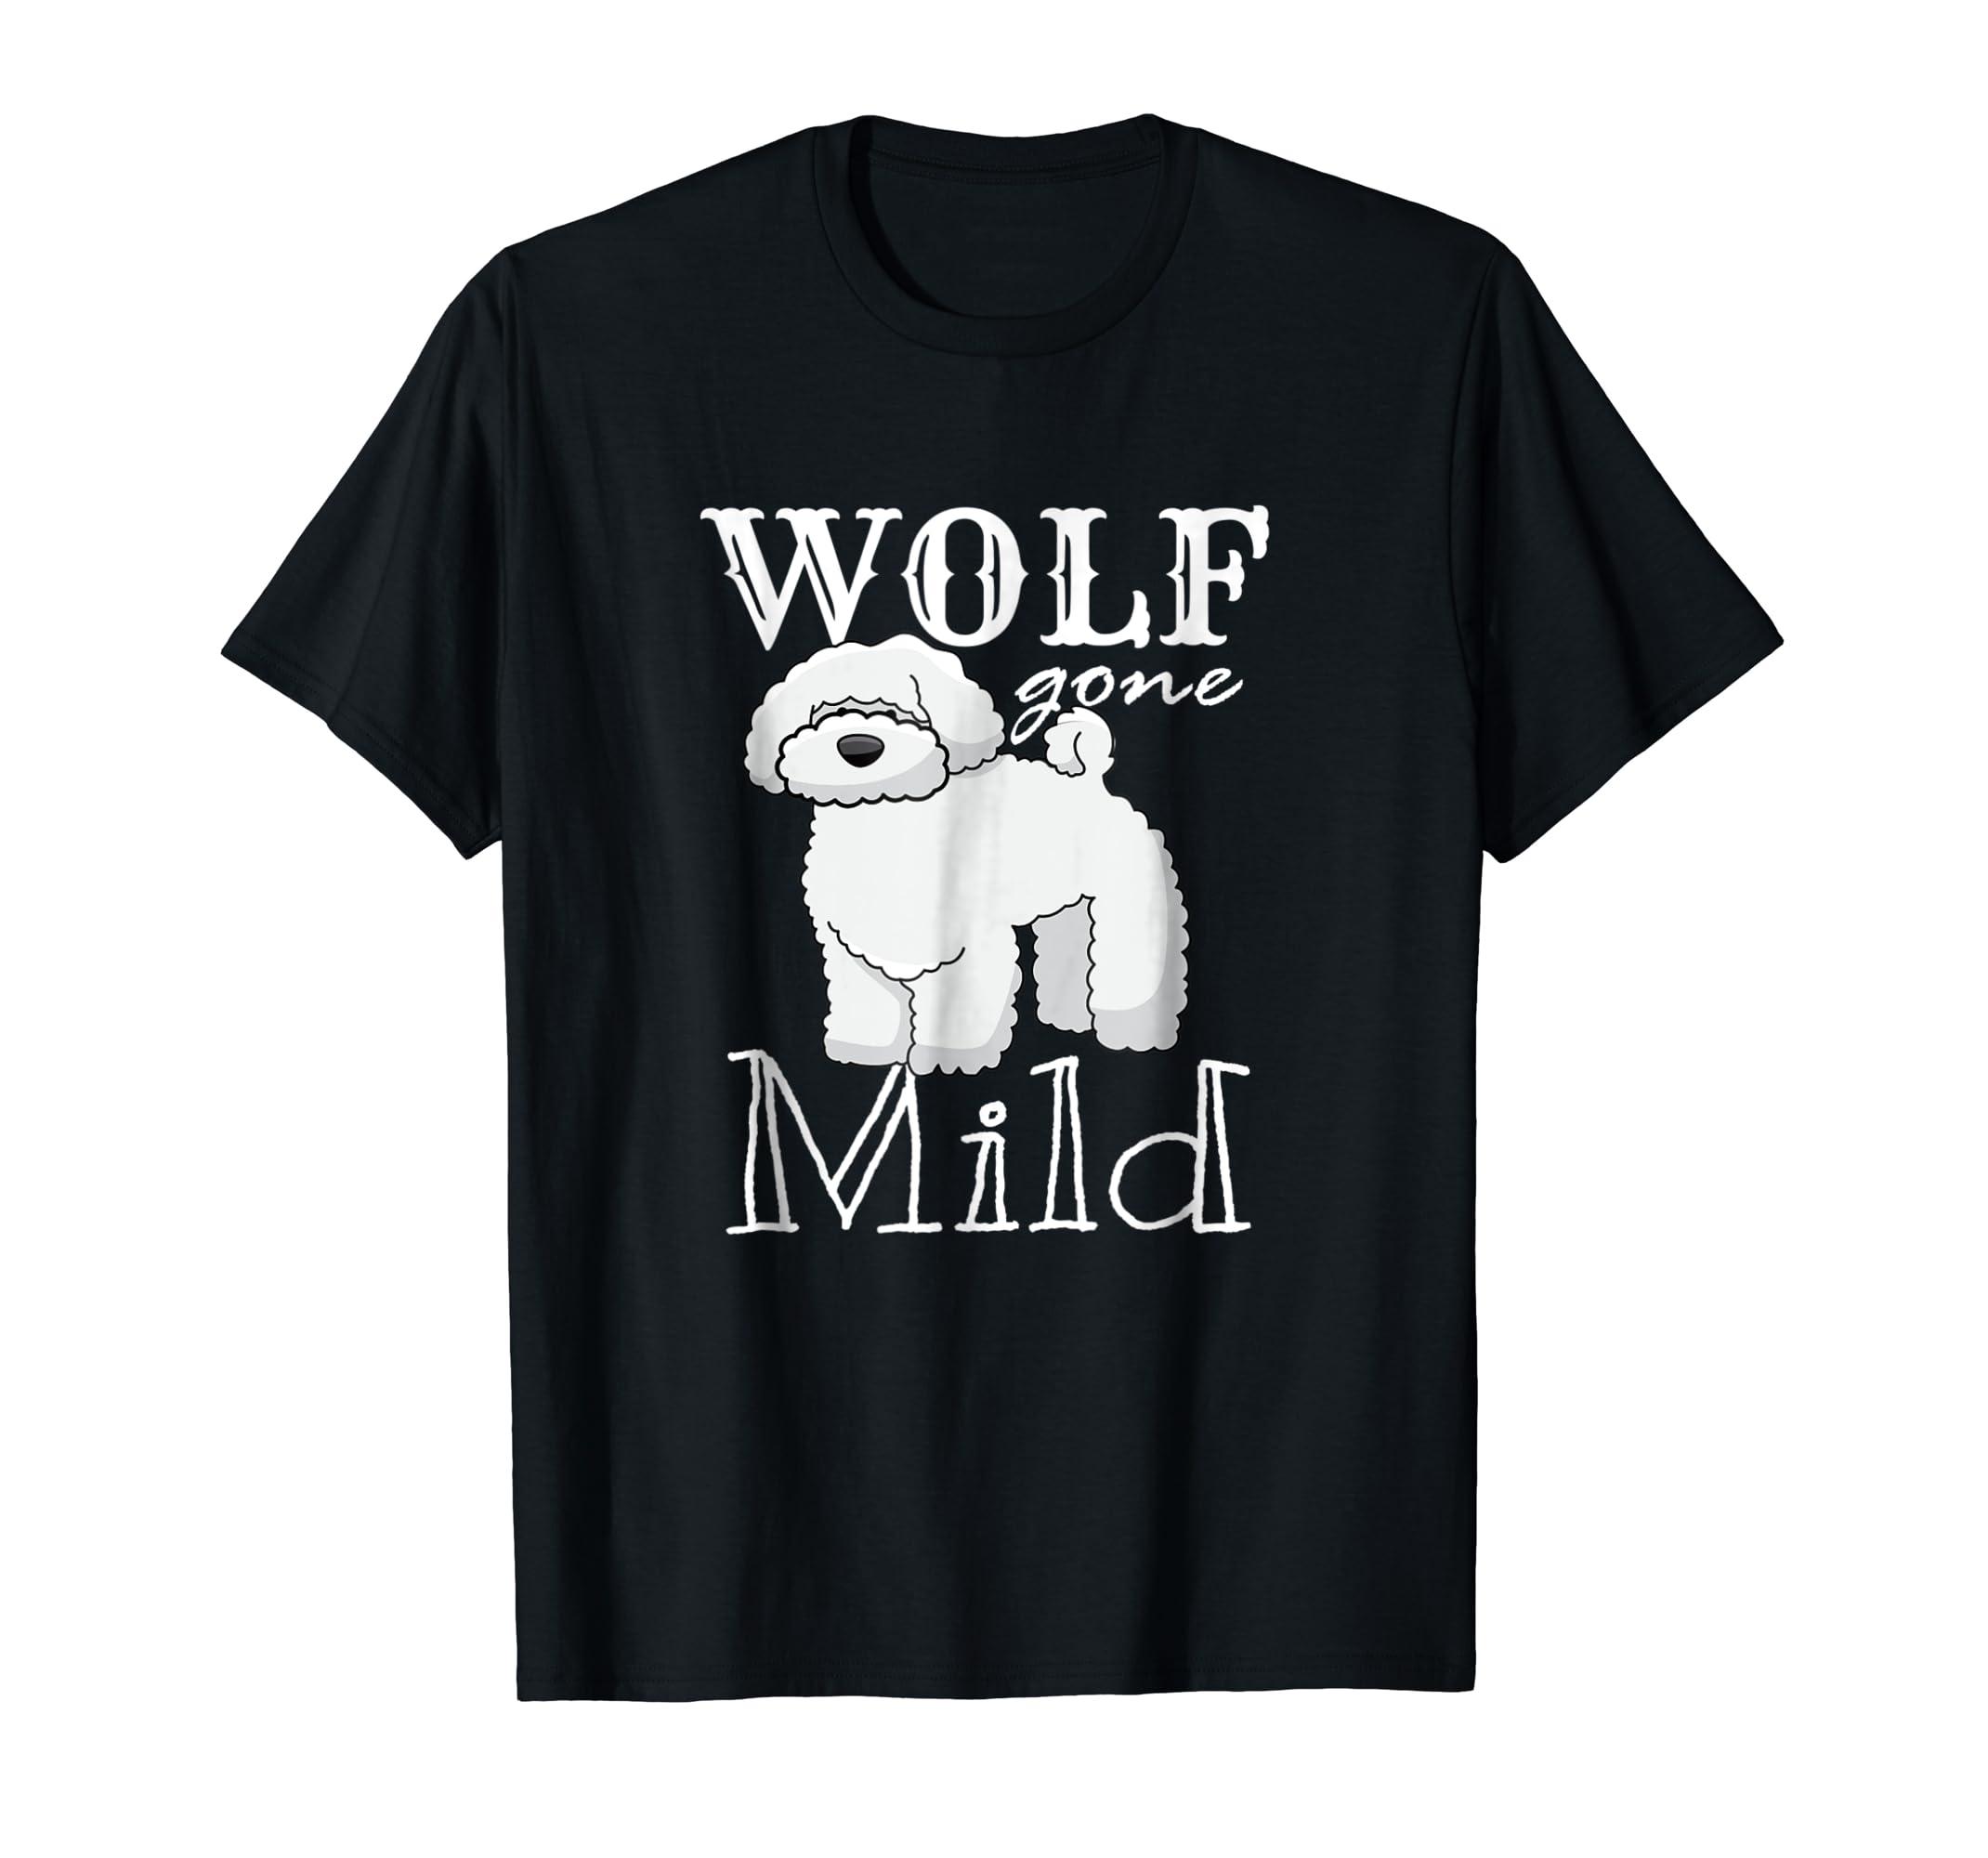 Poodle Dog Bichon Puppy Wolf T-Shirt Cartoon-Men's T-Shirt-Black